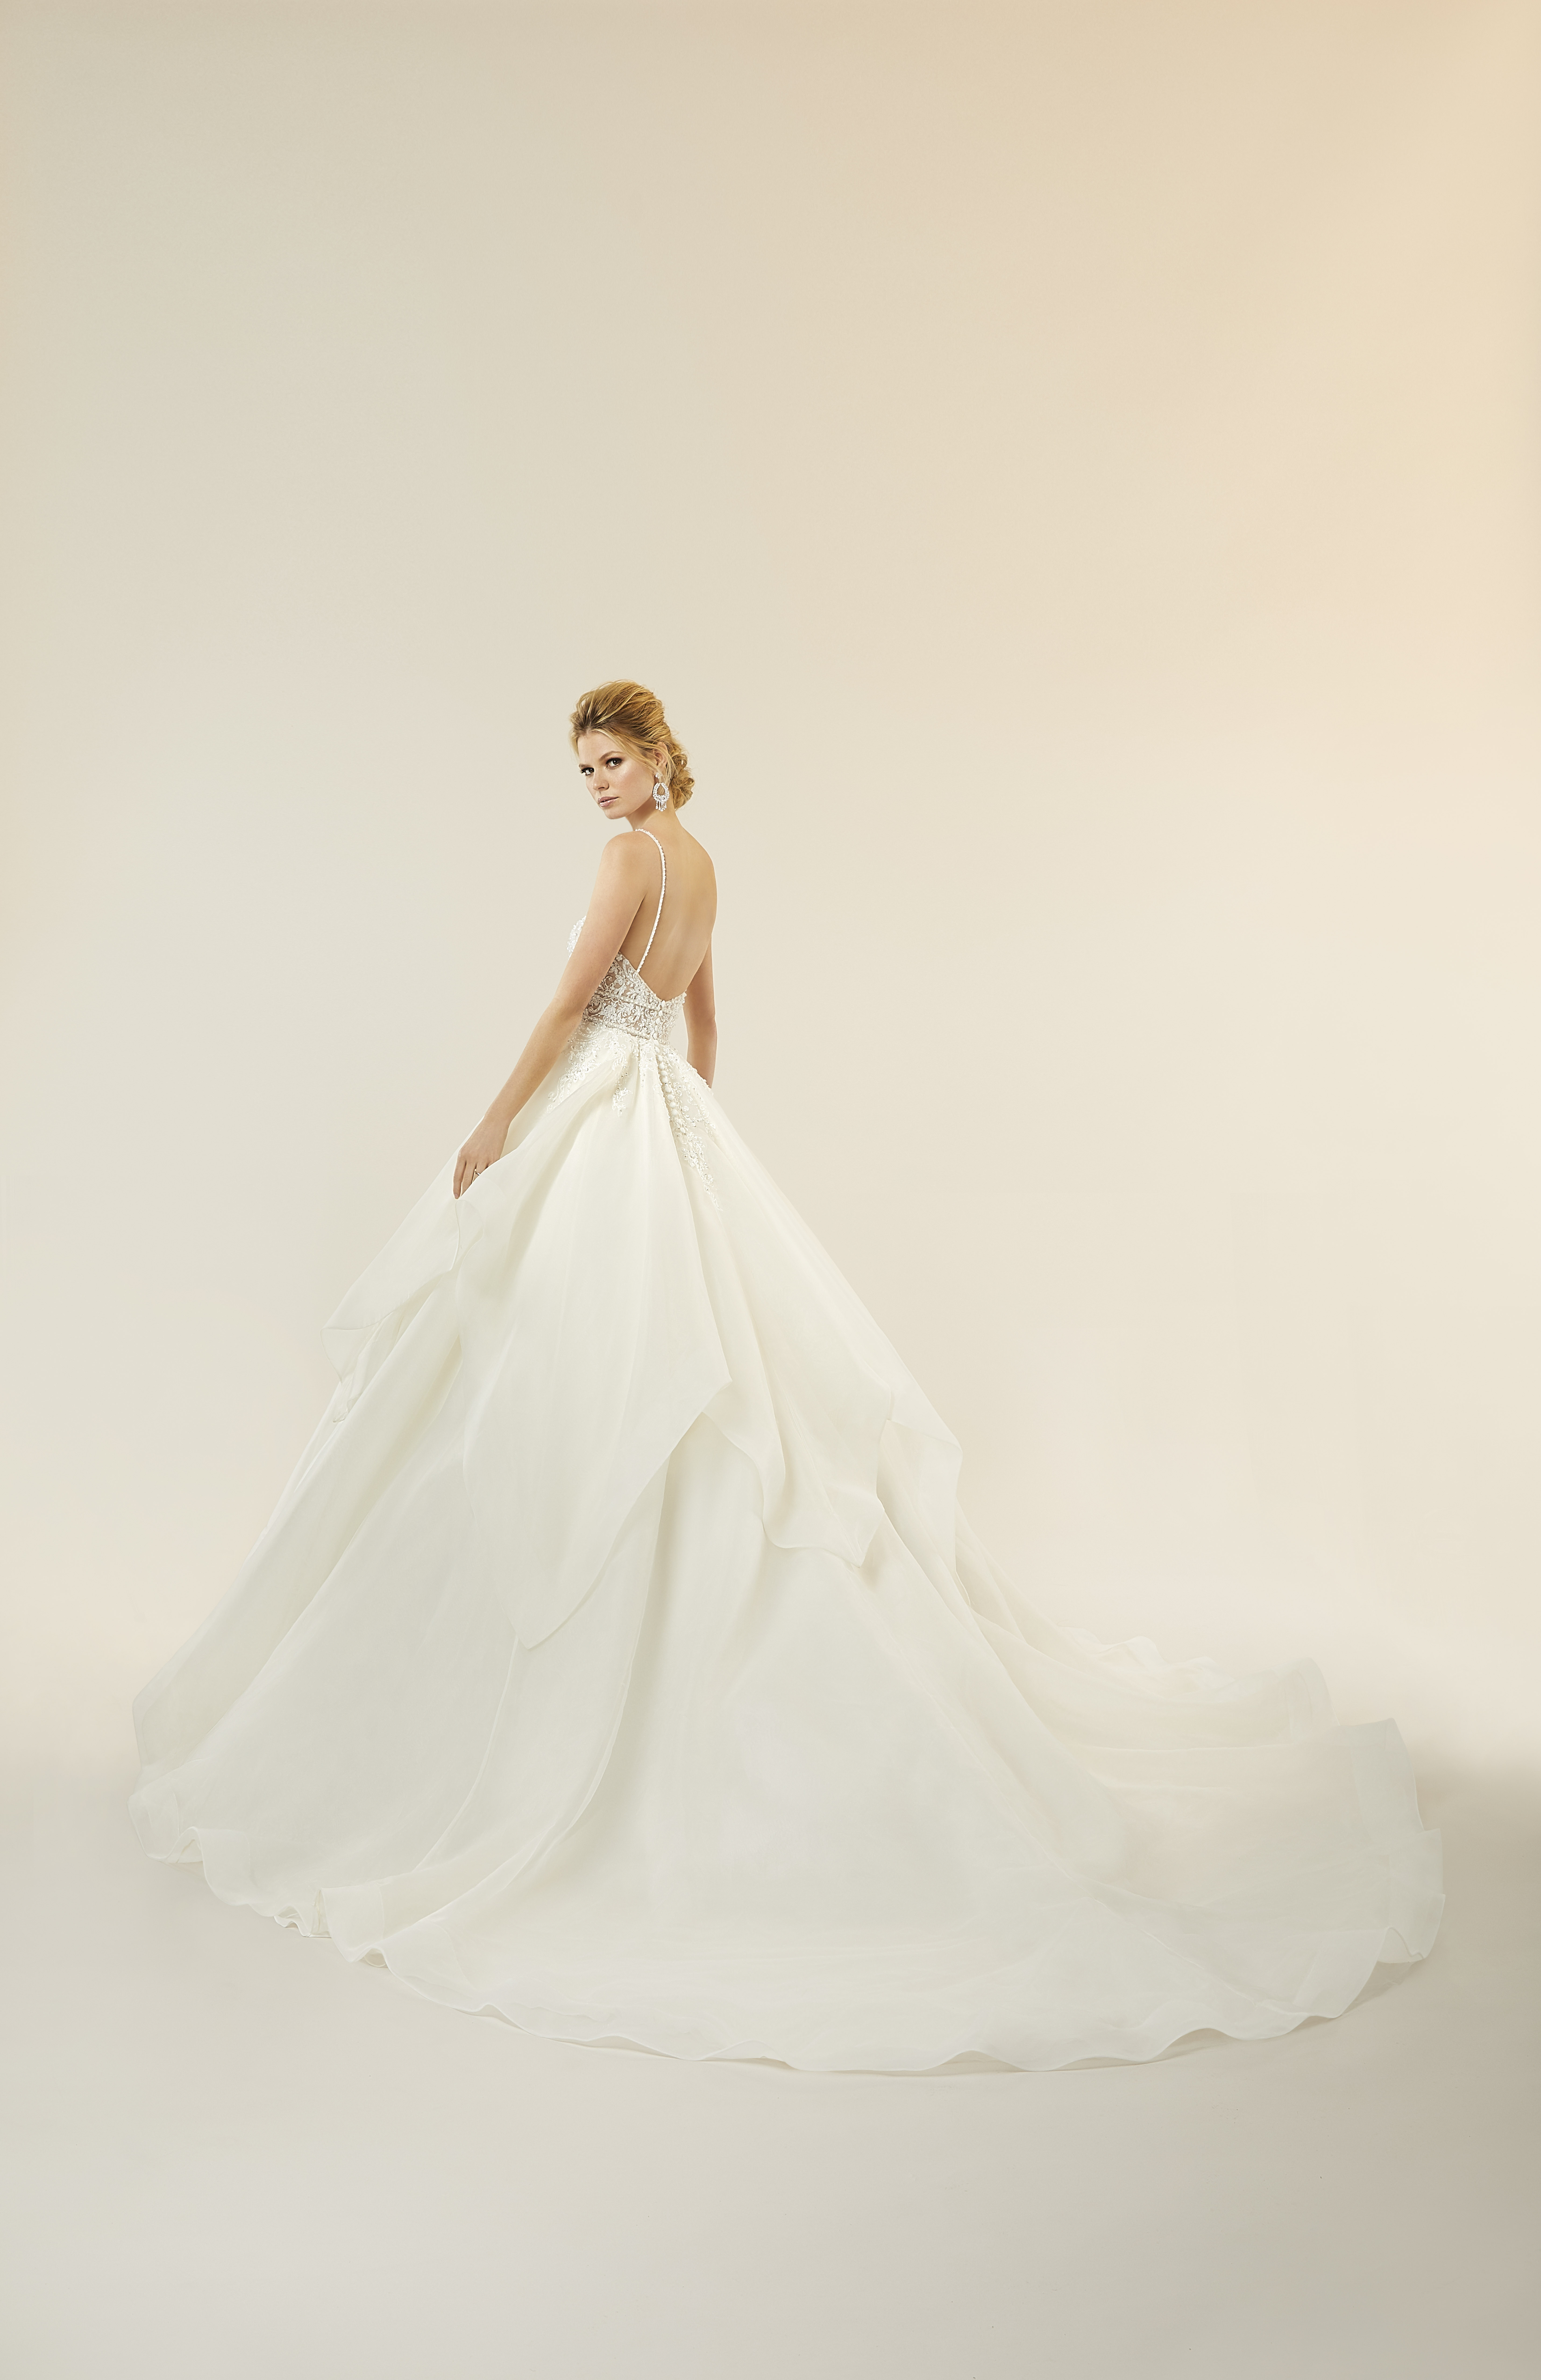 Madeline-Gardner-New-York-51701-wedding-dress-marisol